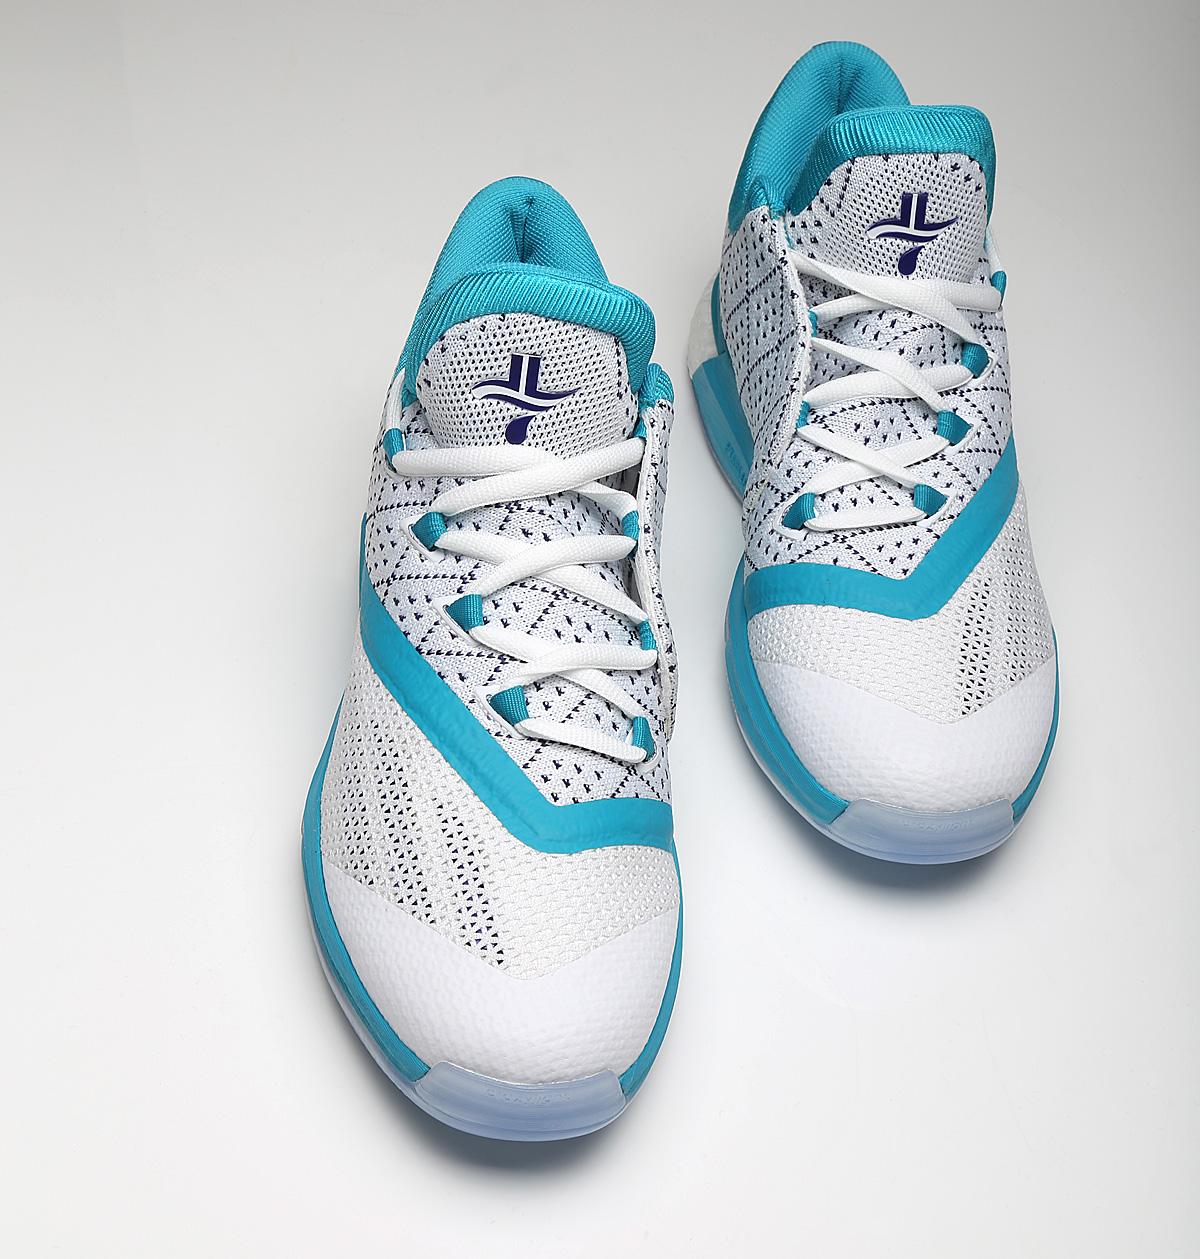 Jeremy-Lin-adidas-Crazylight-Boost_2-5-3